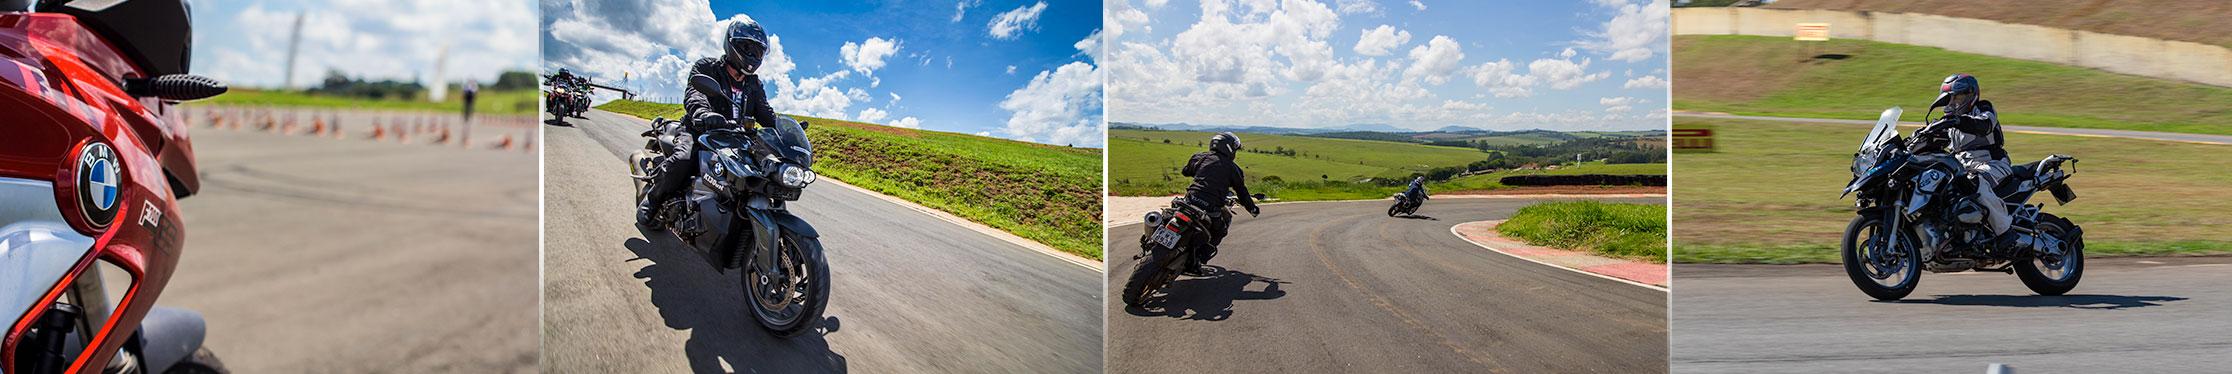 BMW-Rider-Experience_Cursos-RiderTrainig_HighPerformance